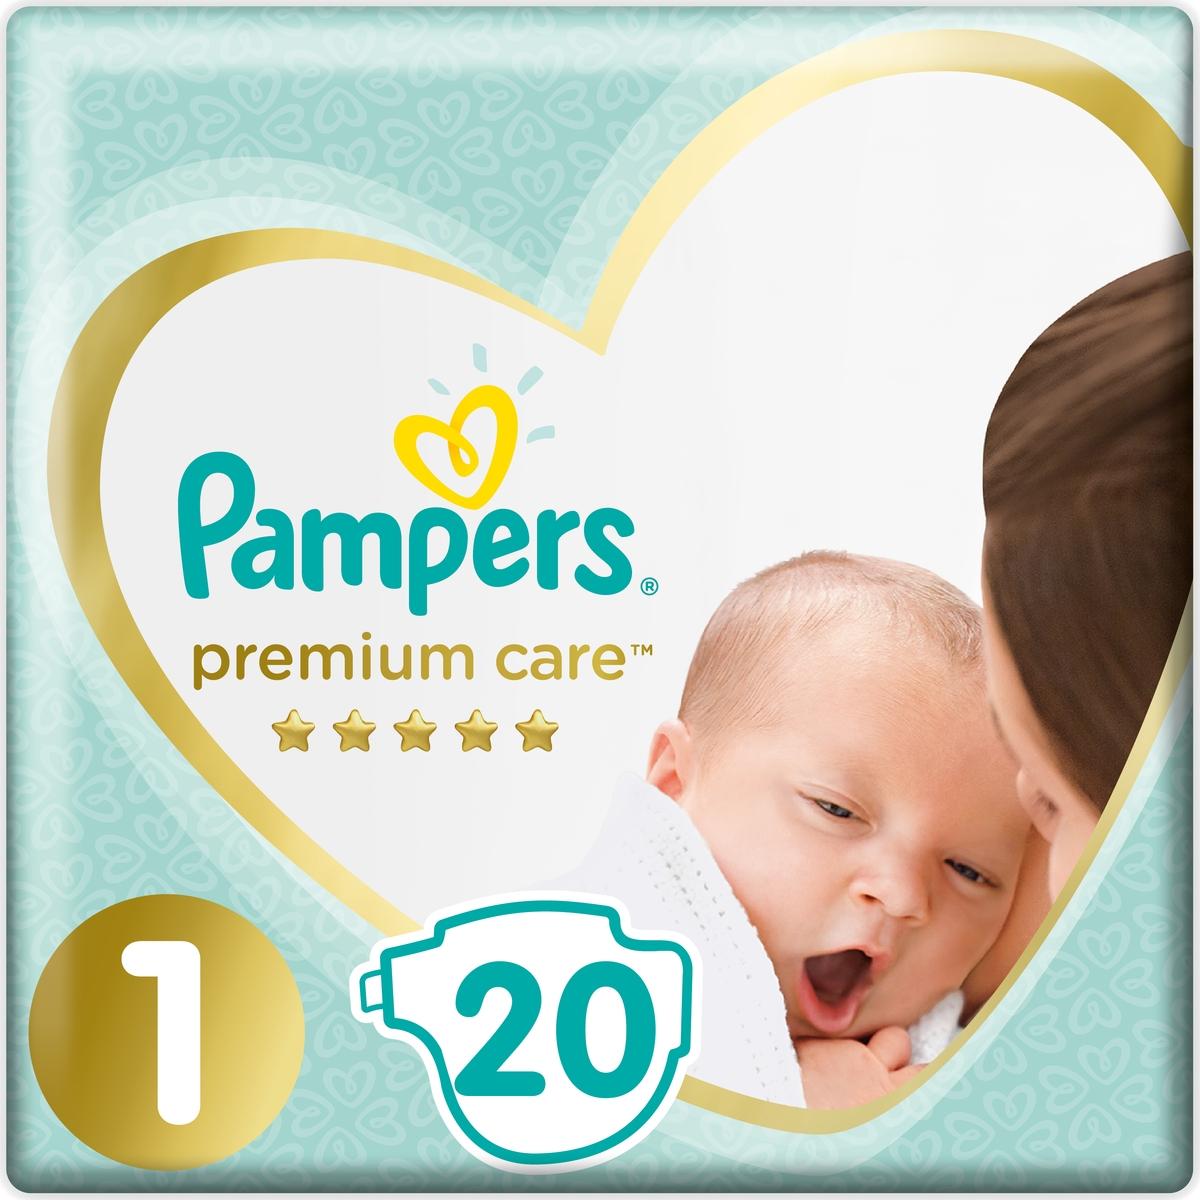 Pampers Подгузники Premium Care 2-5 кг (размер 1) 20 шт подгузники pampers premium care 5 11 кг 42 шт